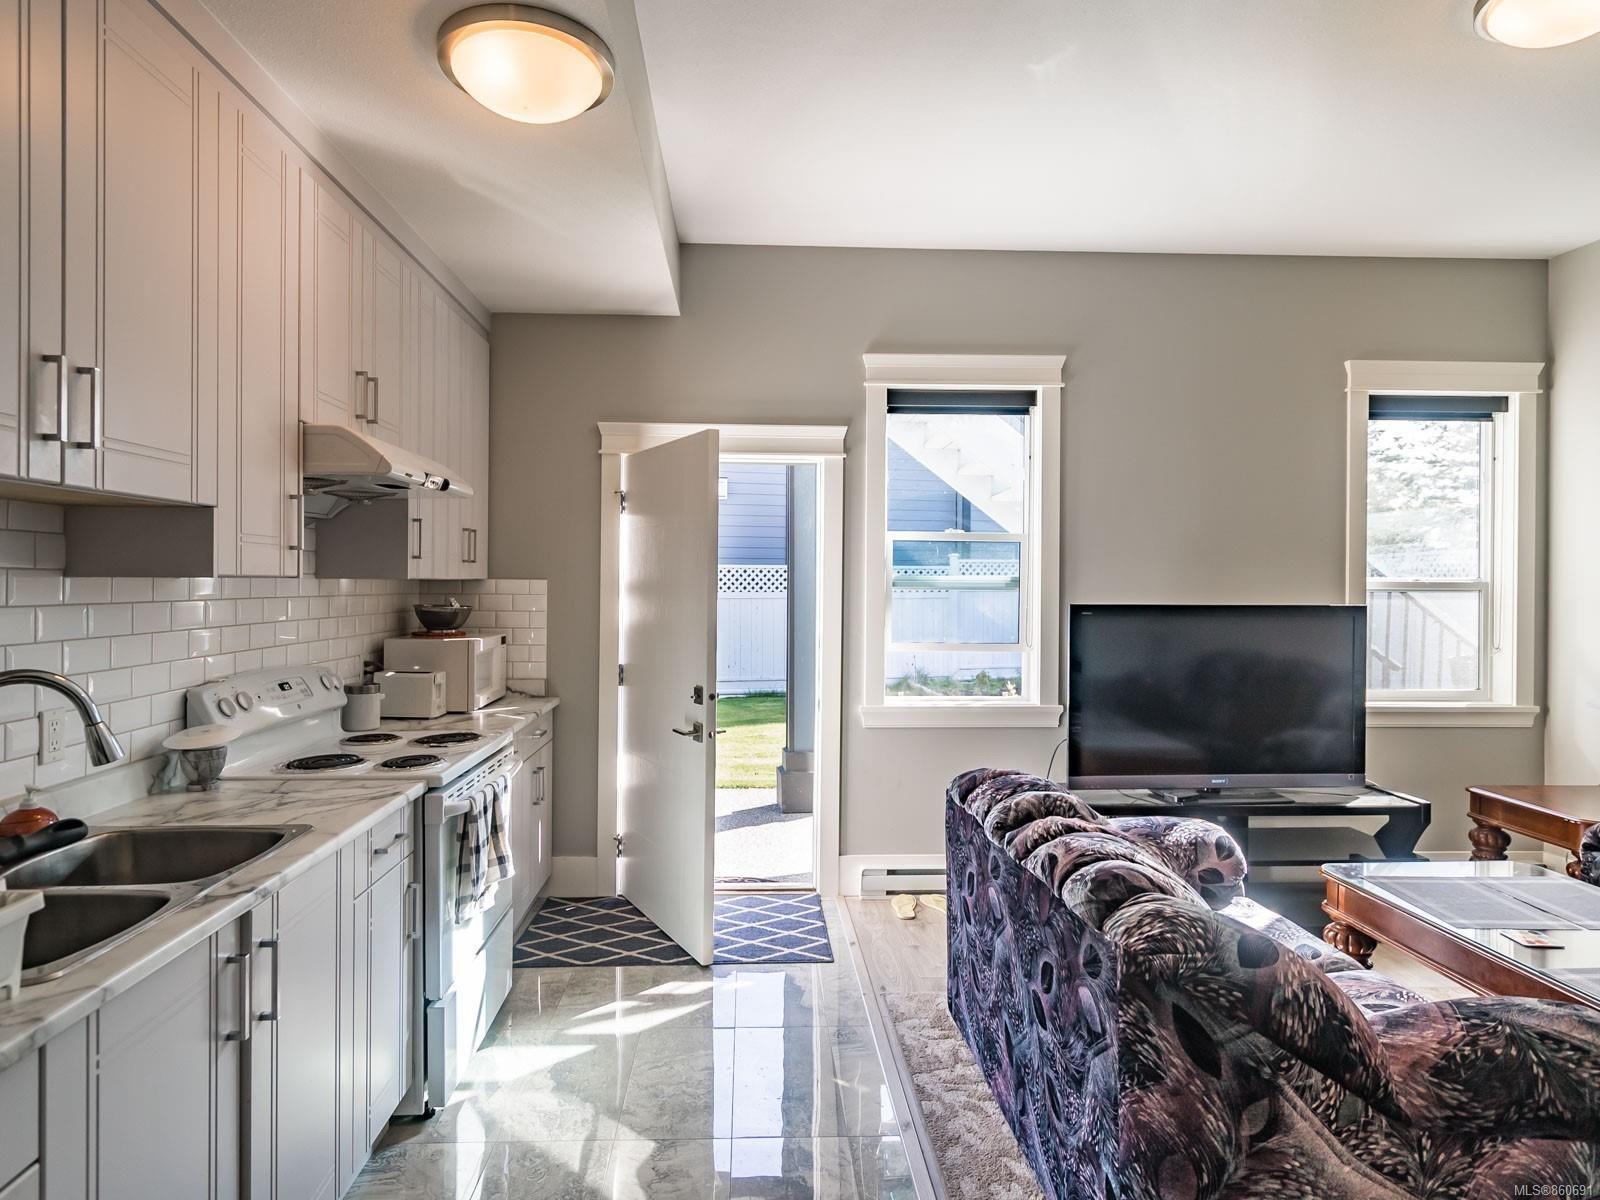 Photo 47: Photos: 5821 Linley Valley Dr in : Na North Nanaimo House for sale (Nanaimo)  : MLS®# 860691